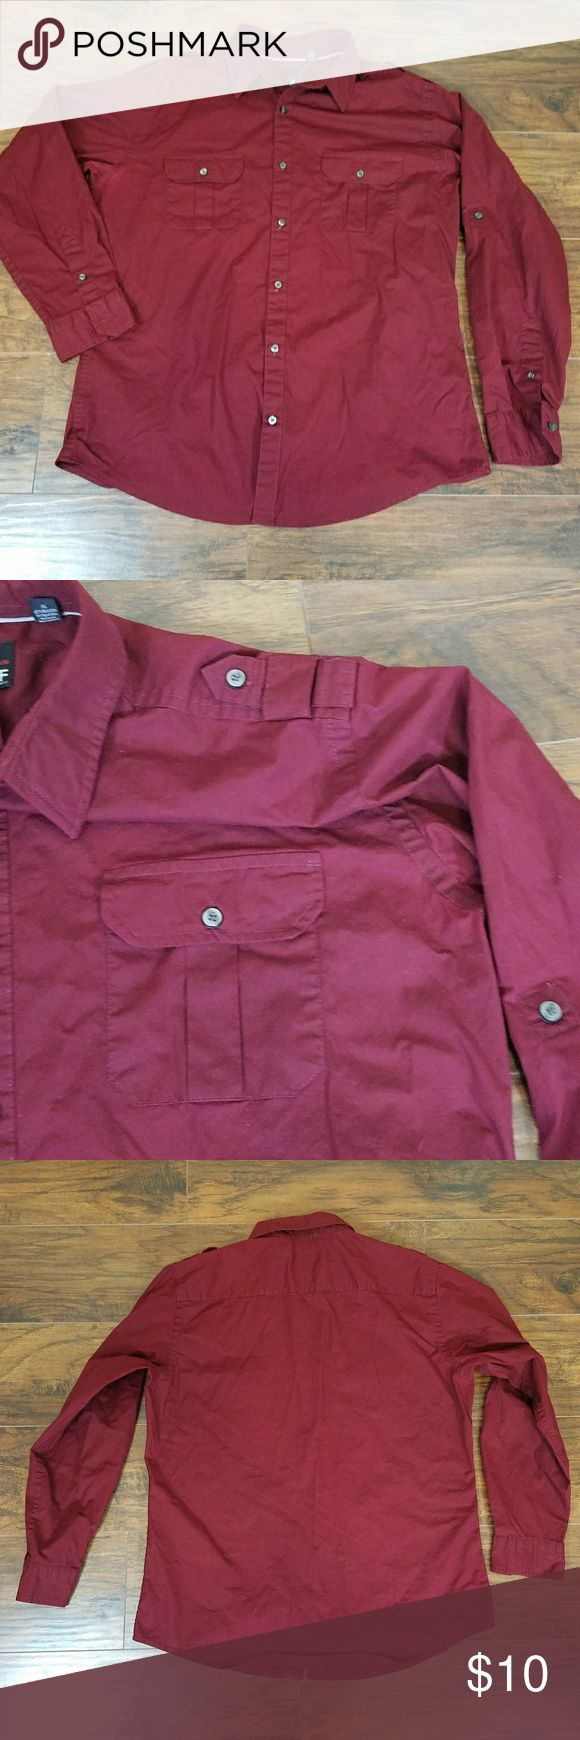 Pict j ferrar modern fit 1 - Jf J Ferrar Casual Shirt With Great Detailing